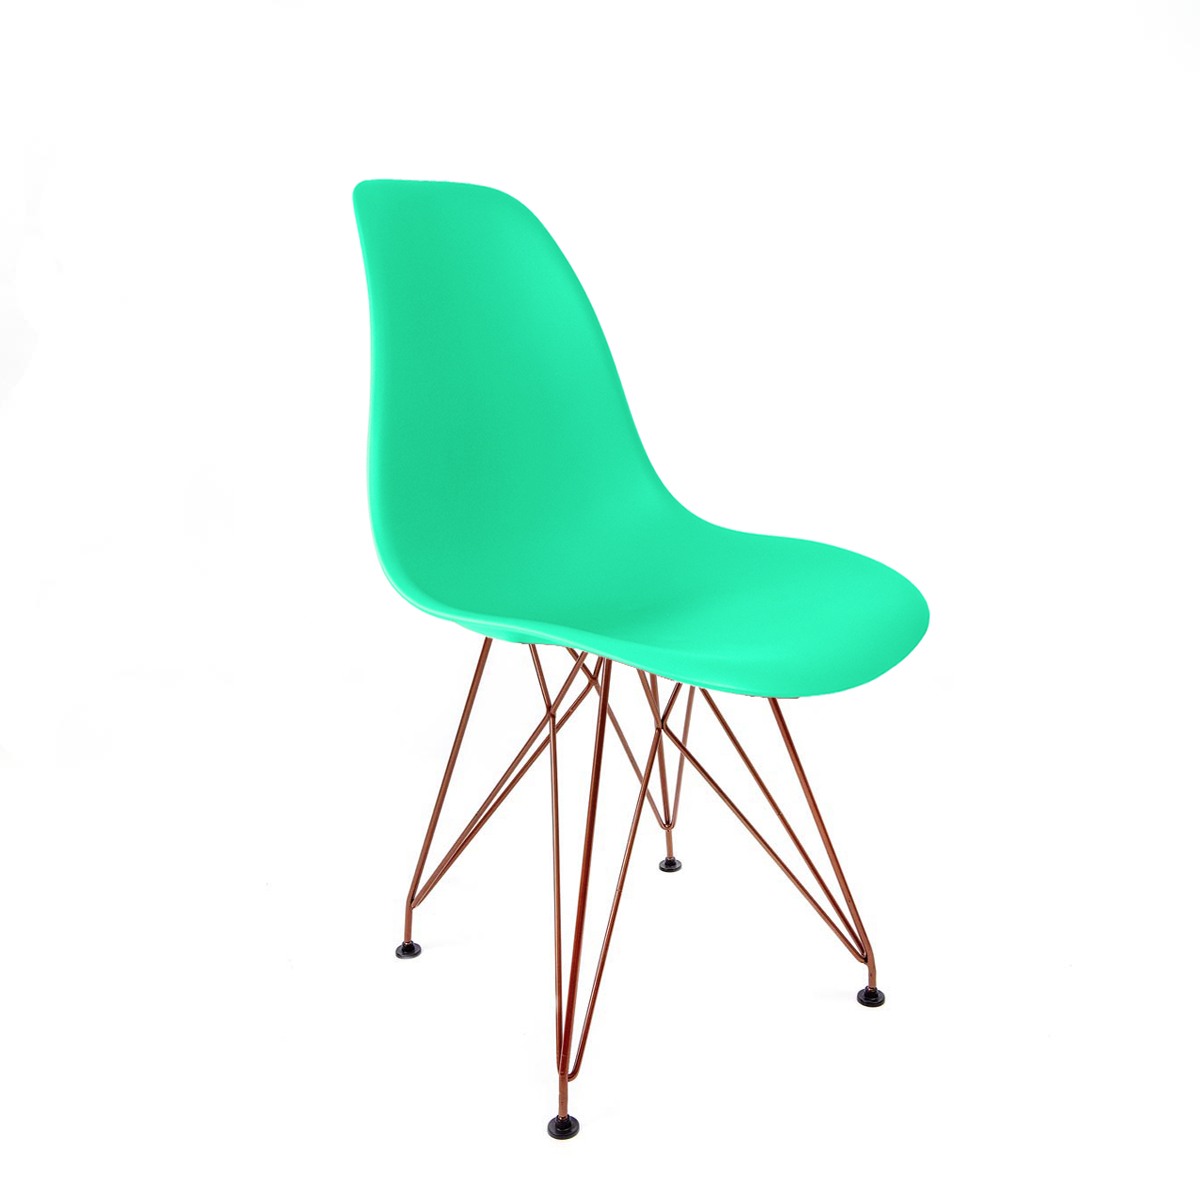 Cadeira Eames Verde Tiffany - Base Eiffel Cobre